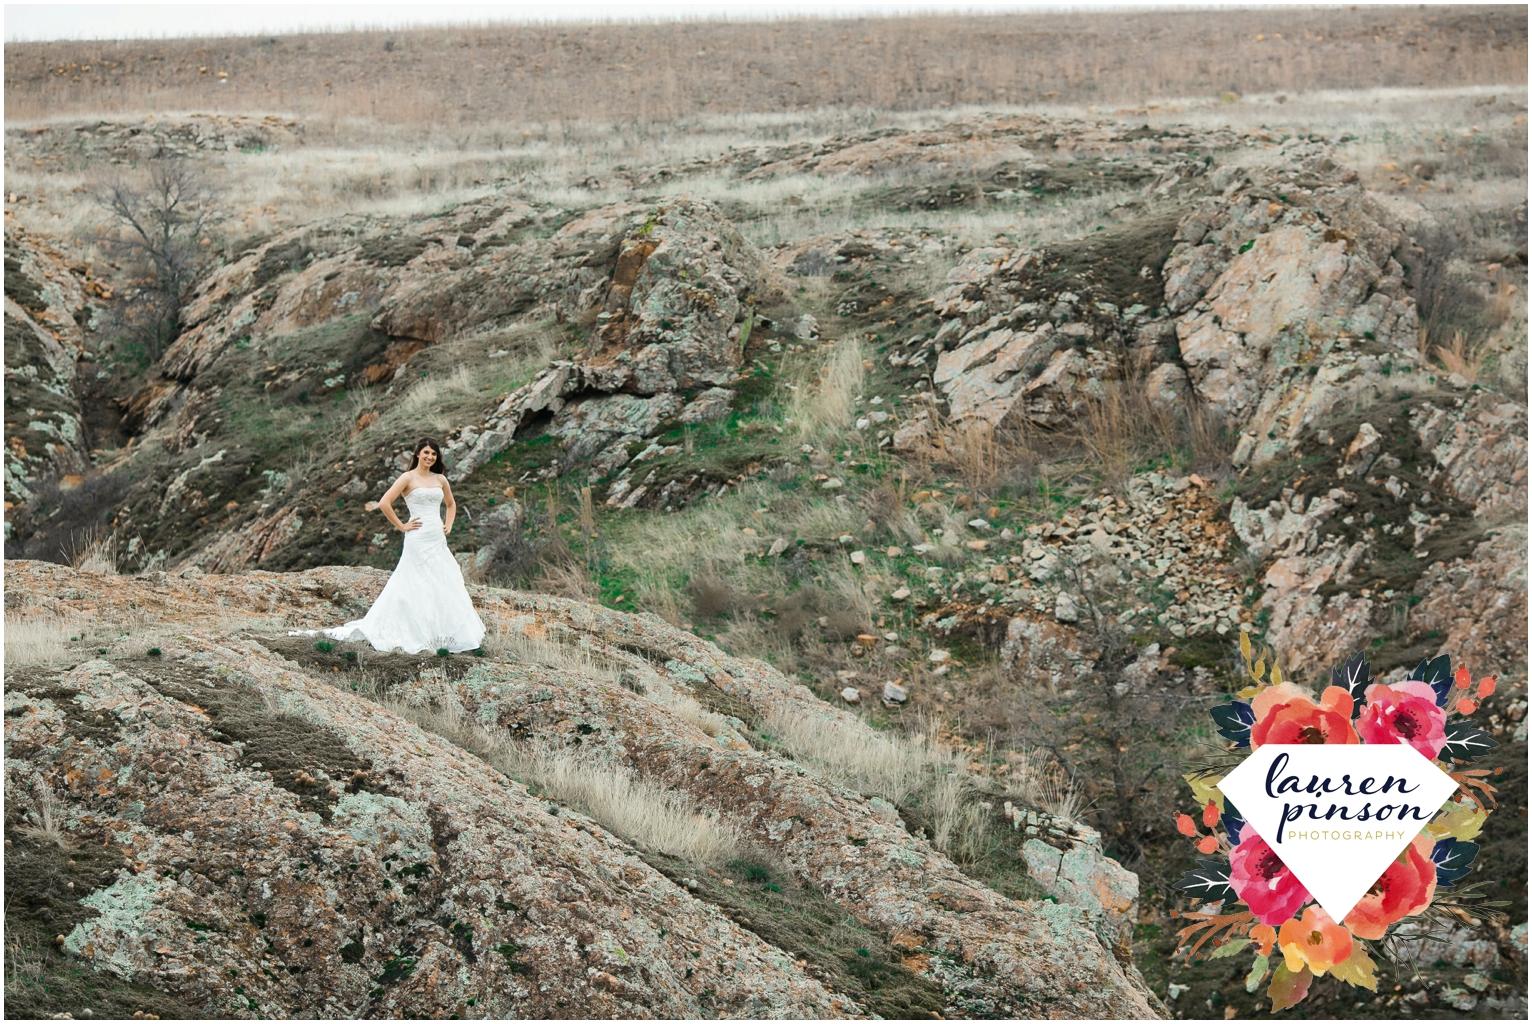 wichita-falls-wedding-photographer-oklahoma-wichita-mountains-bridal-session-bridals-photography_0685.jpg